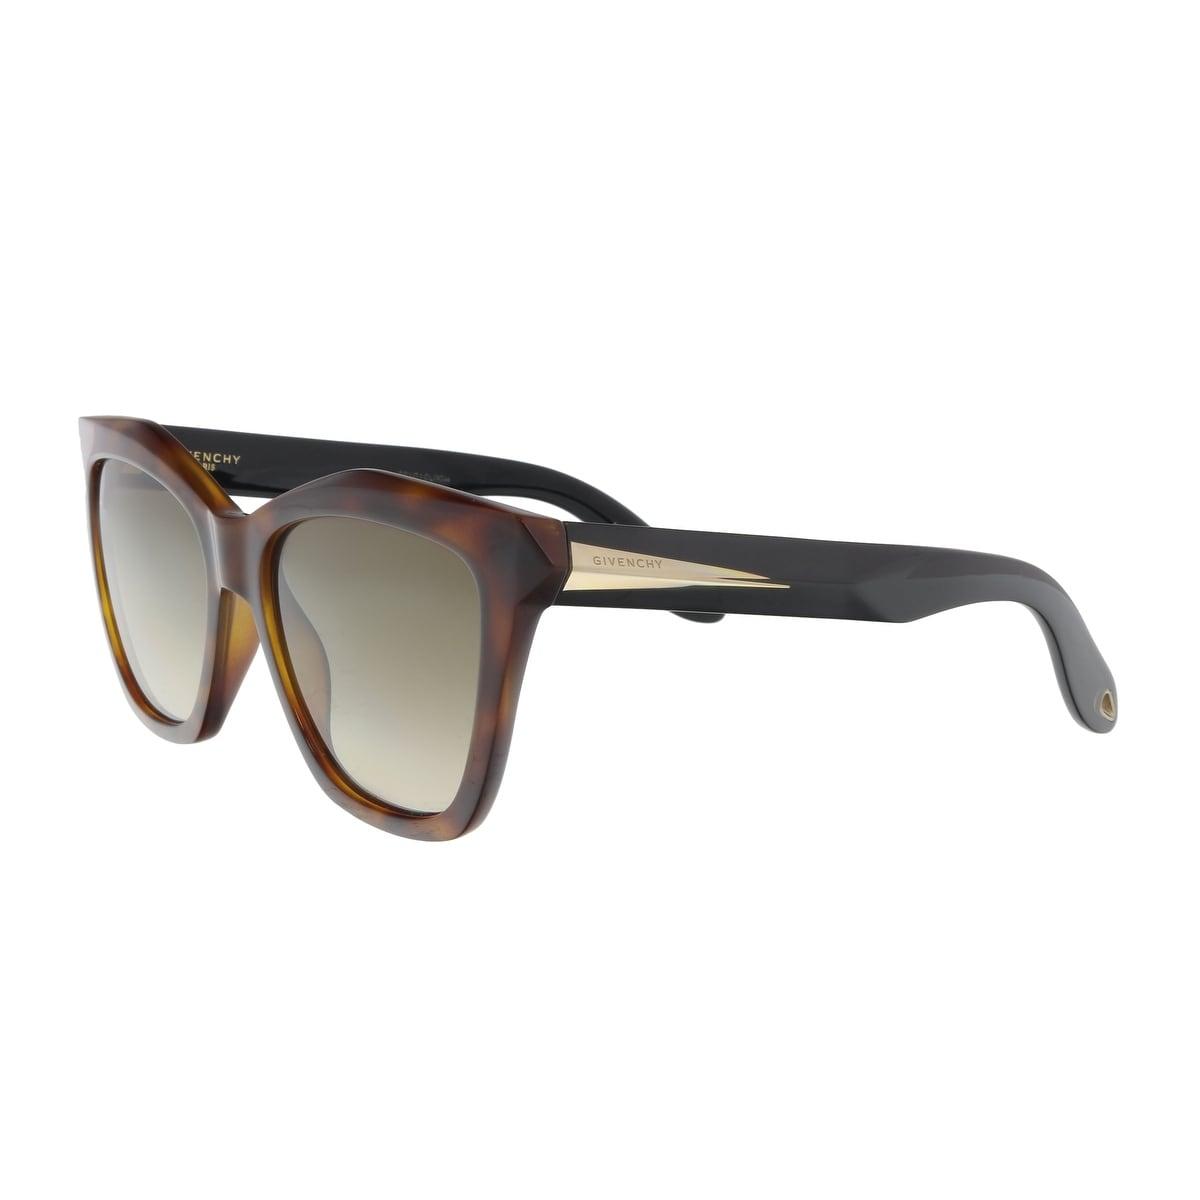 a59e6cee0beb Shop Givenchy GV7008S 0QON Havana Black Square Sunglasses - 53-17 ...